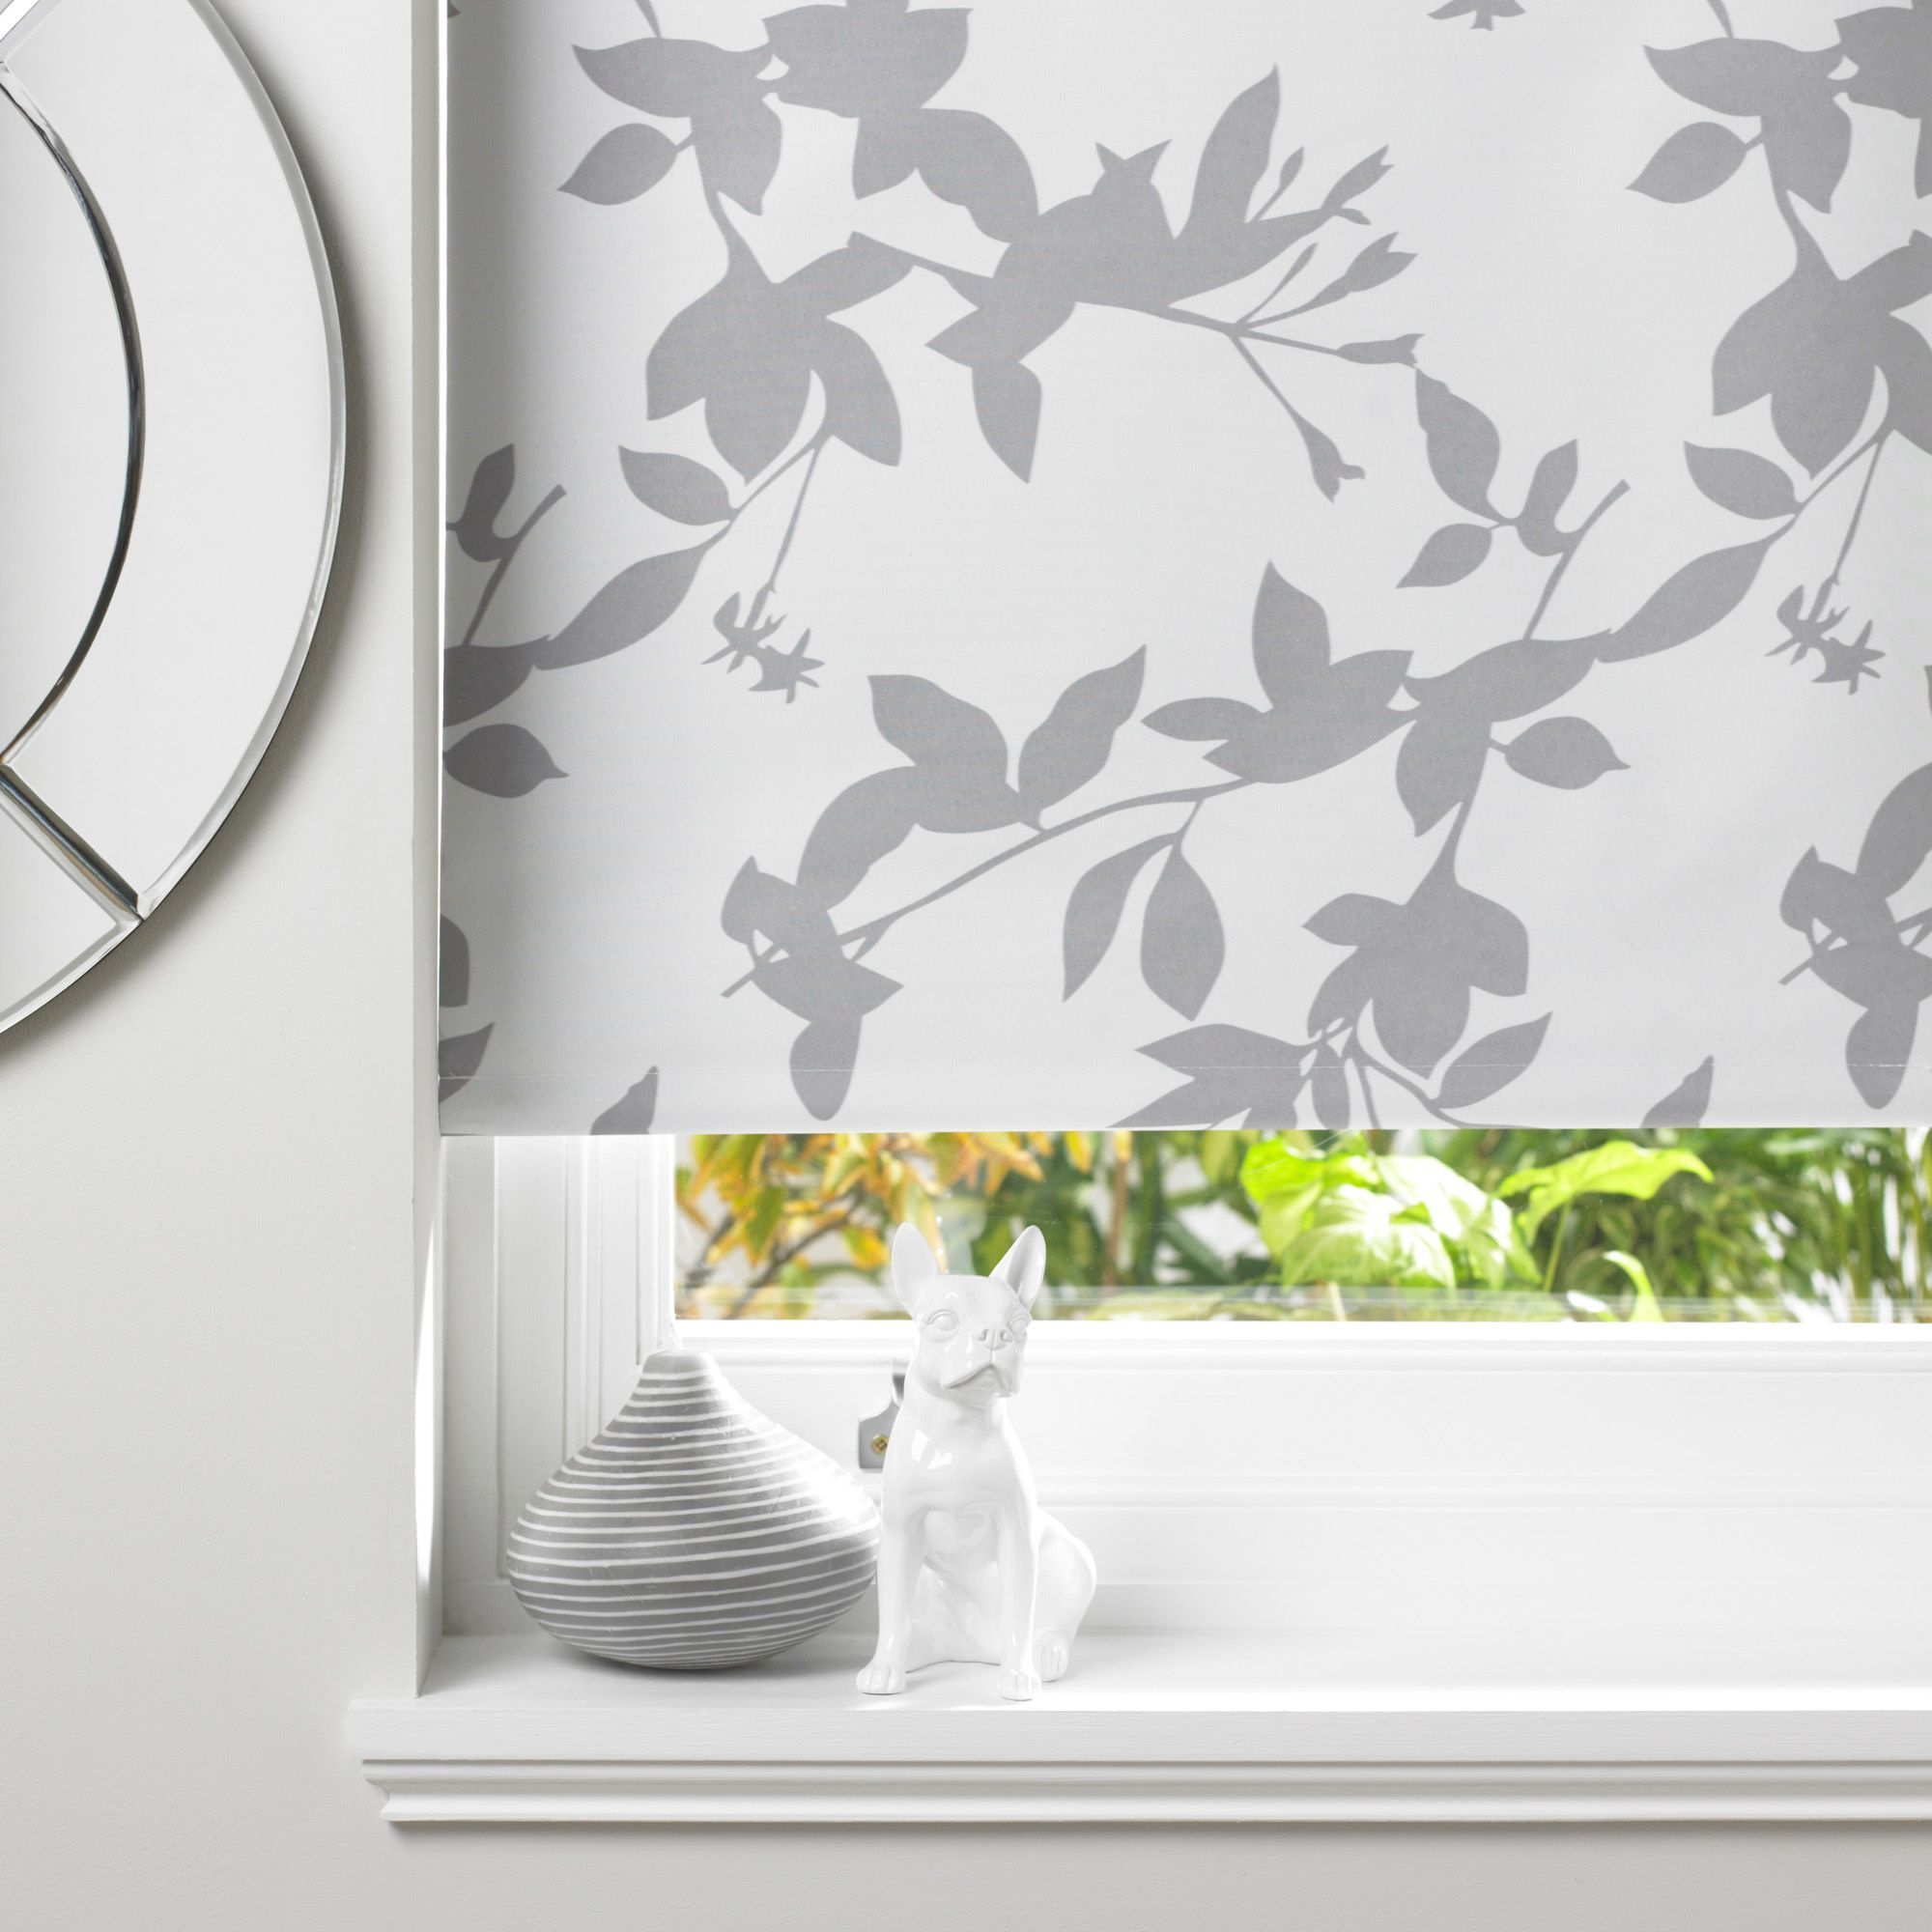 Bathroom Window Blinds B&Q colours pheacia corded grey & white roller blind (l)160 cm (w)60